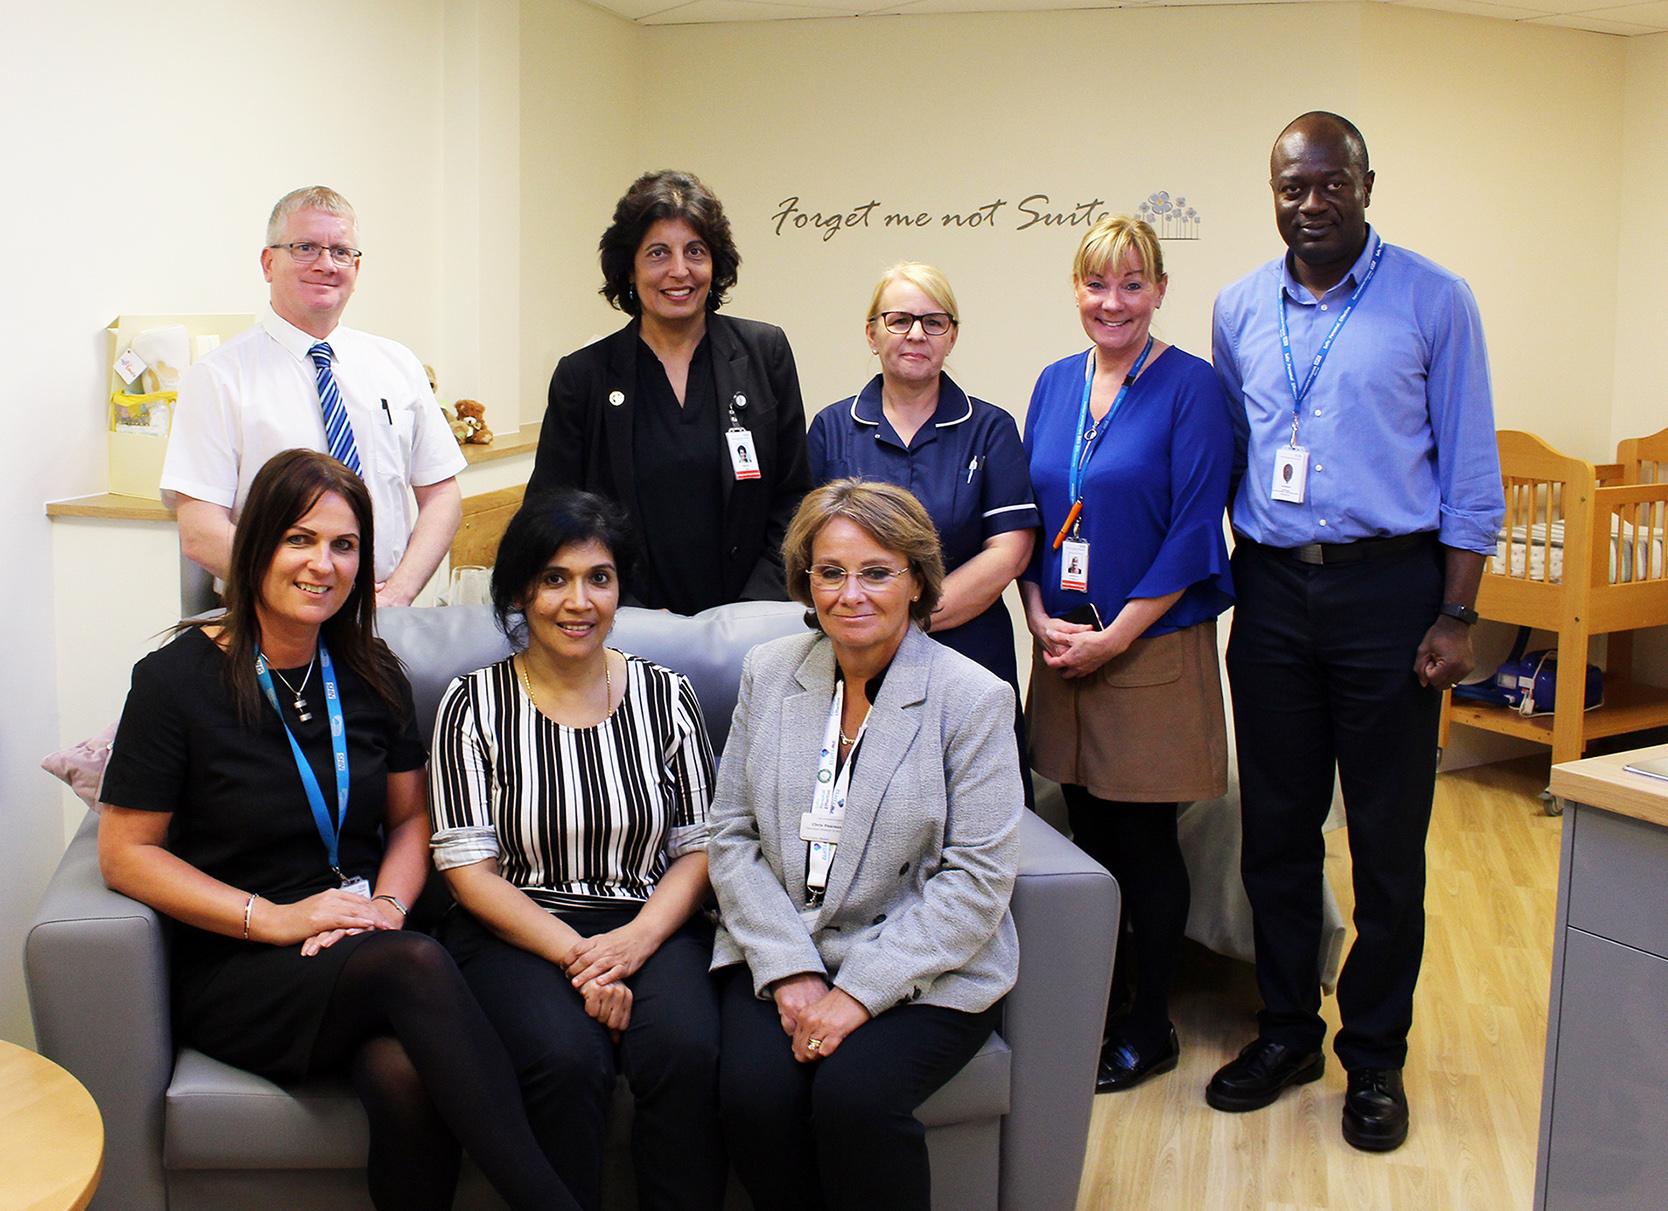 leading london teaching hospitals - HD1668×1211